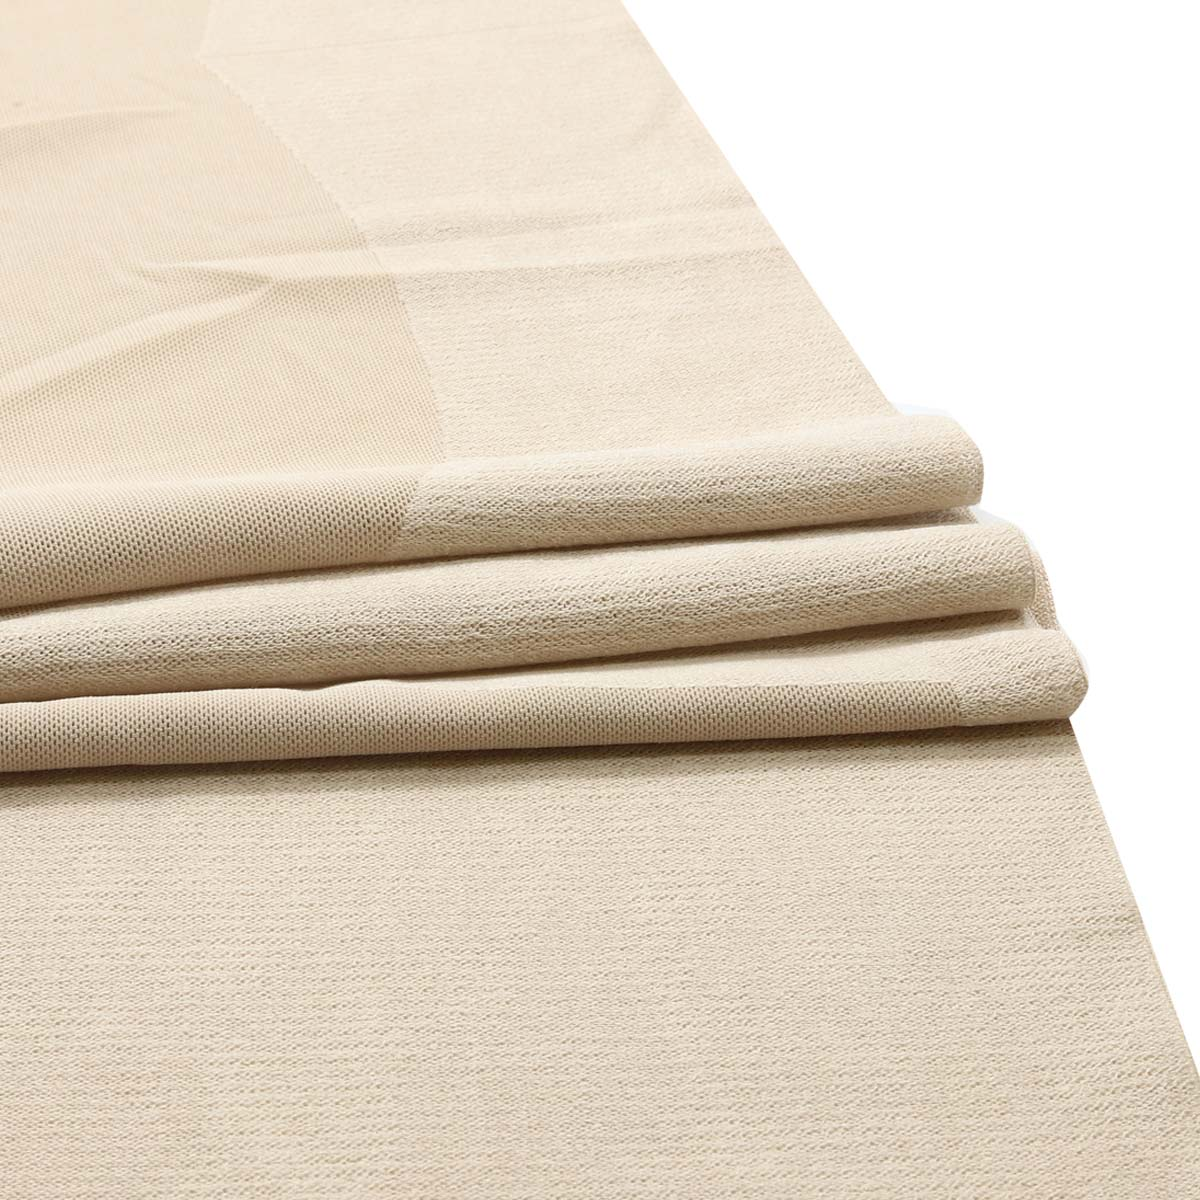 SU 143 Ткань эластичная бельевая 43 см*10